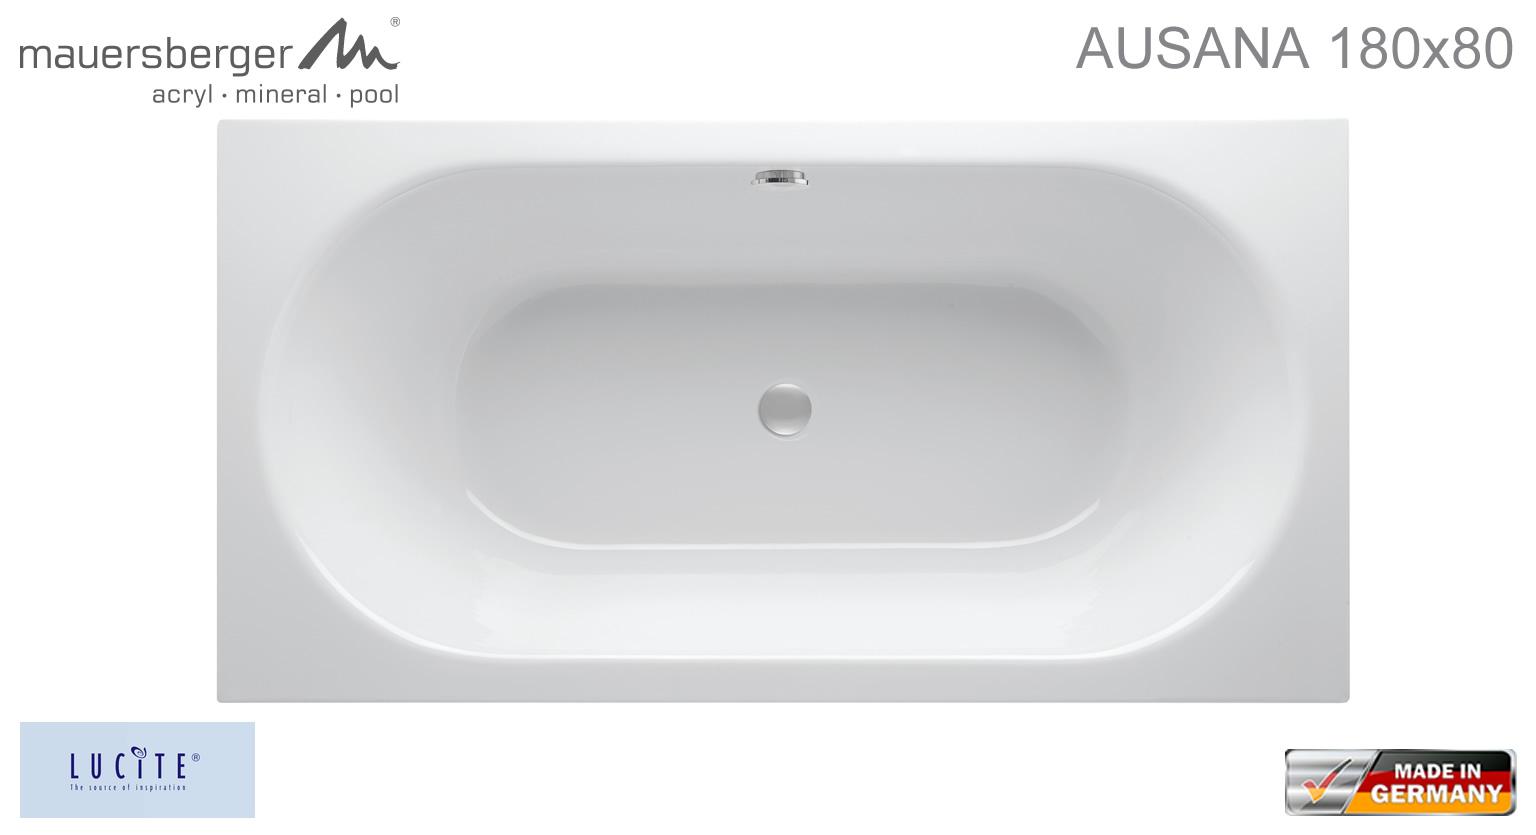 mauersberger badewanne ausana 180 x 80 cm rechteck acryl impulsbad. Black Bedroom Furniture Sets. Home Design Ideas